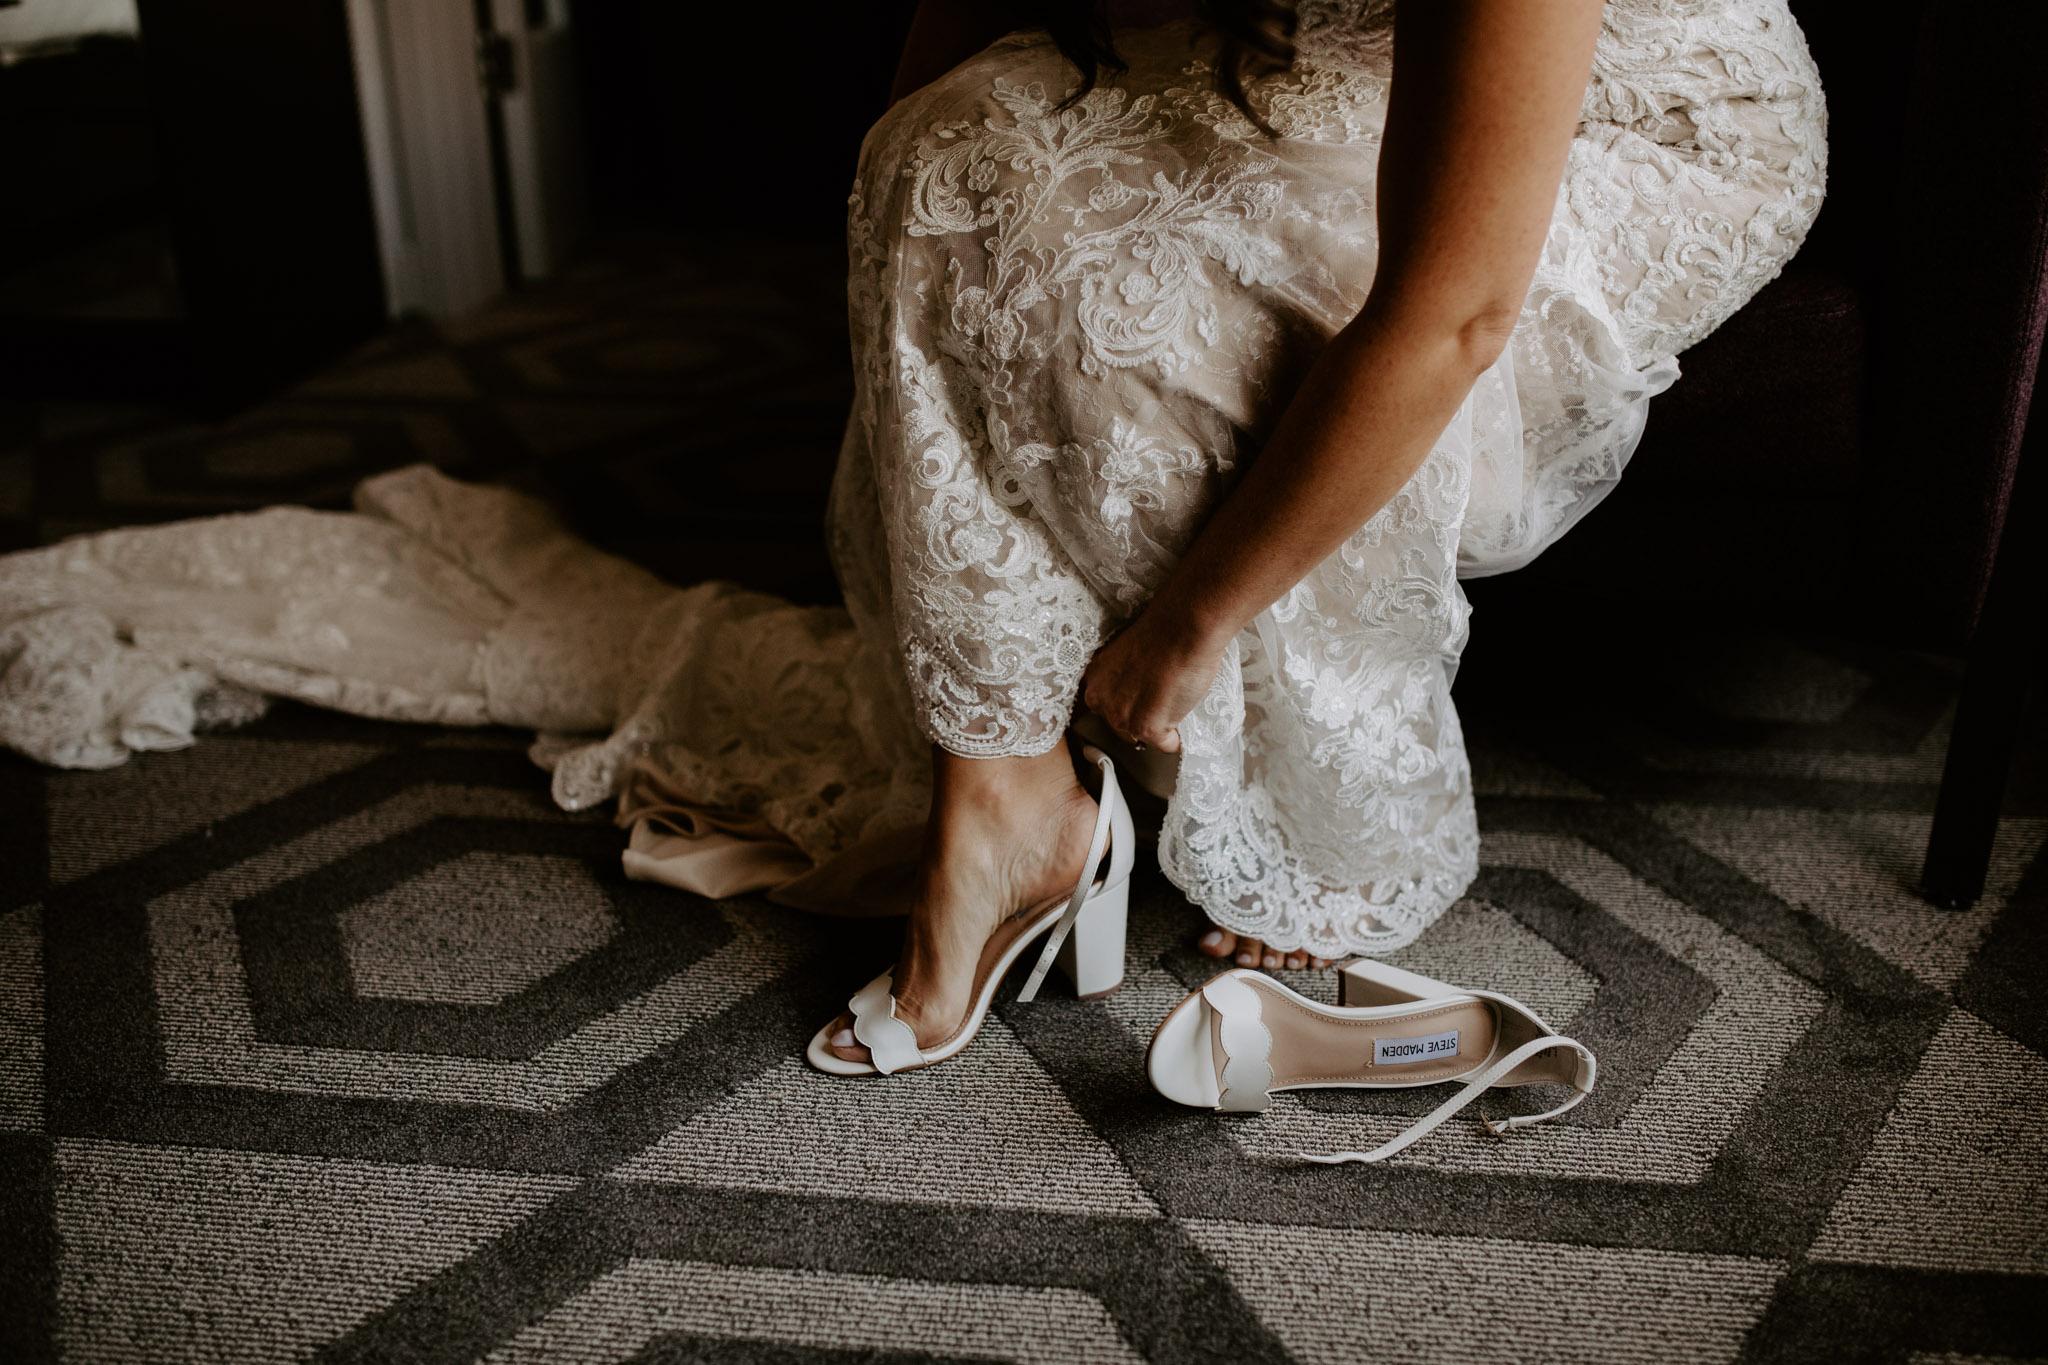 Liberty Village Wedding - bride putting shoes on